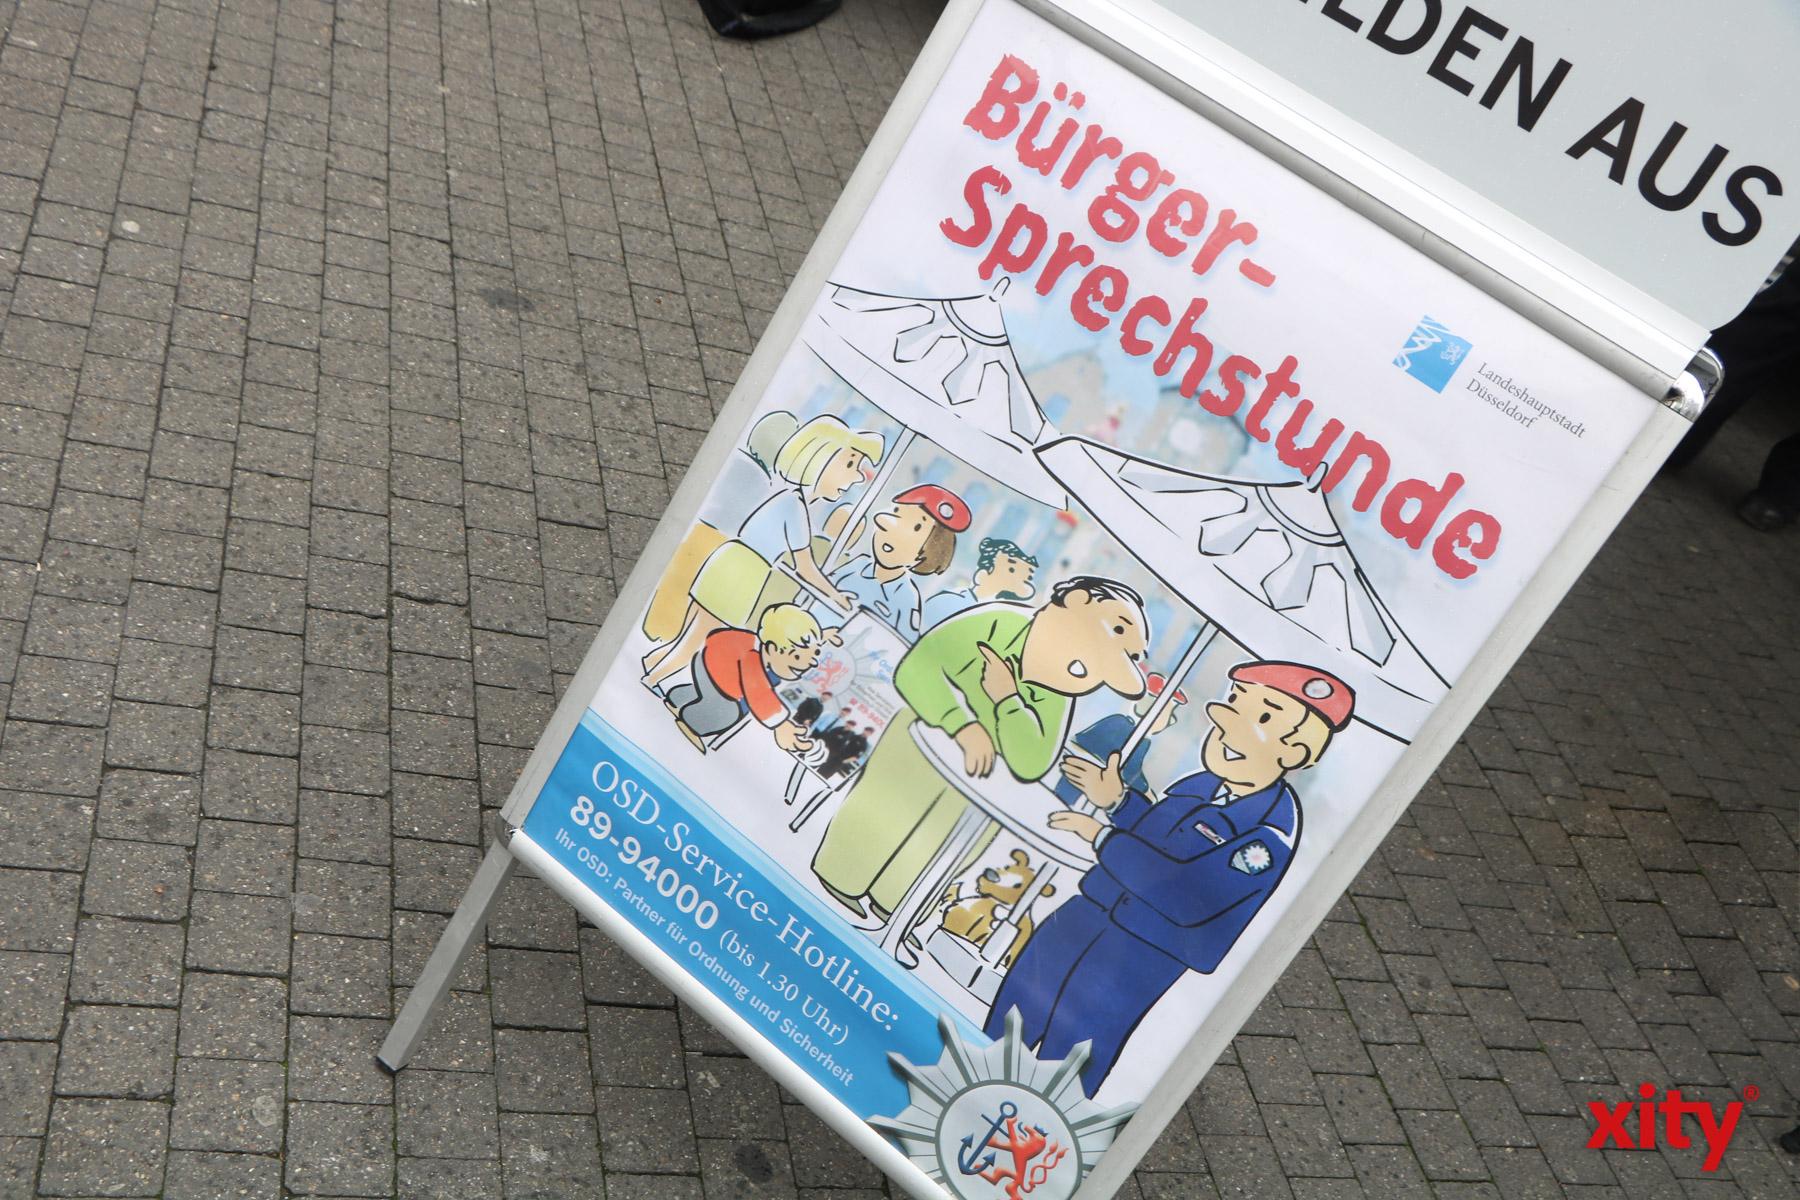 OSD-Bürgersprechstunden in Oberbilk (Foto: xity)